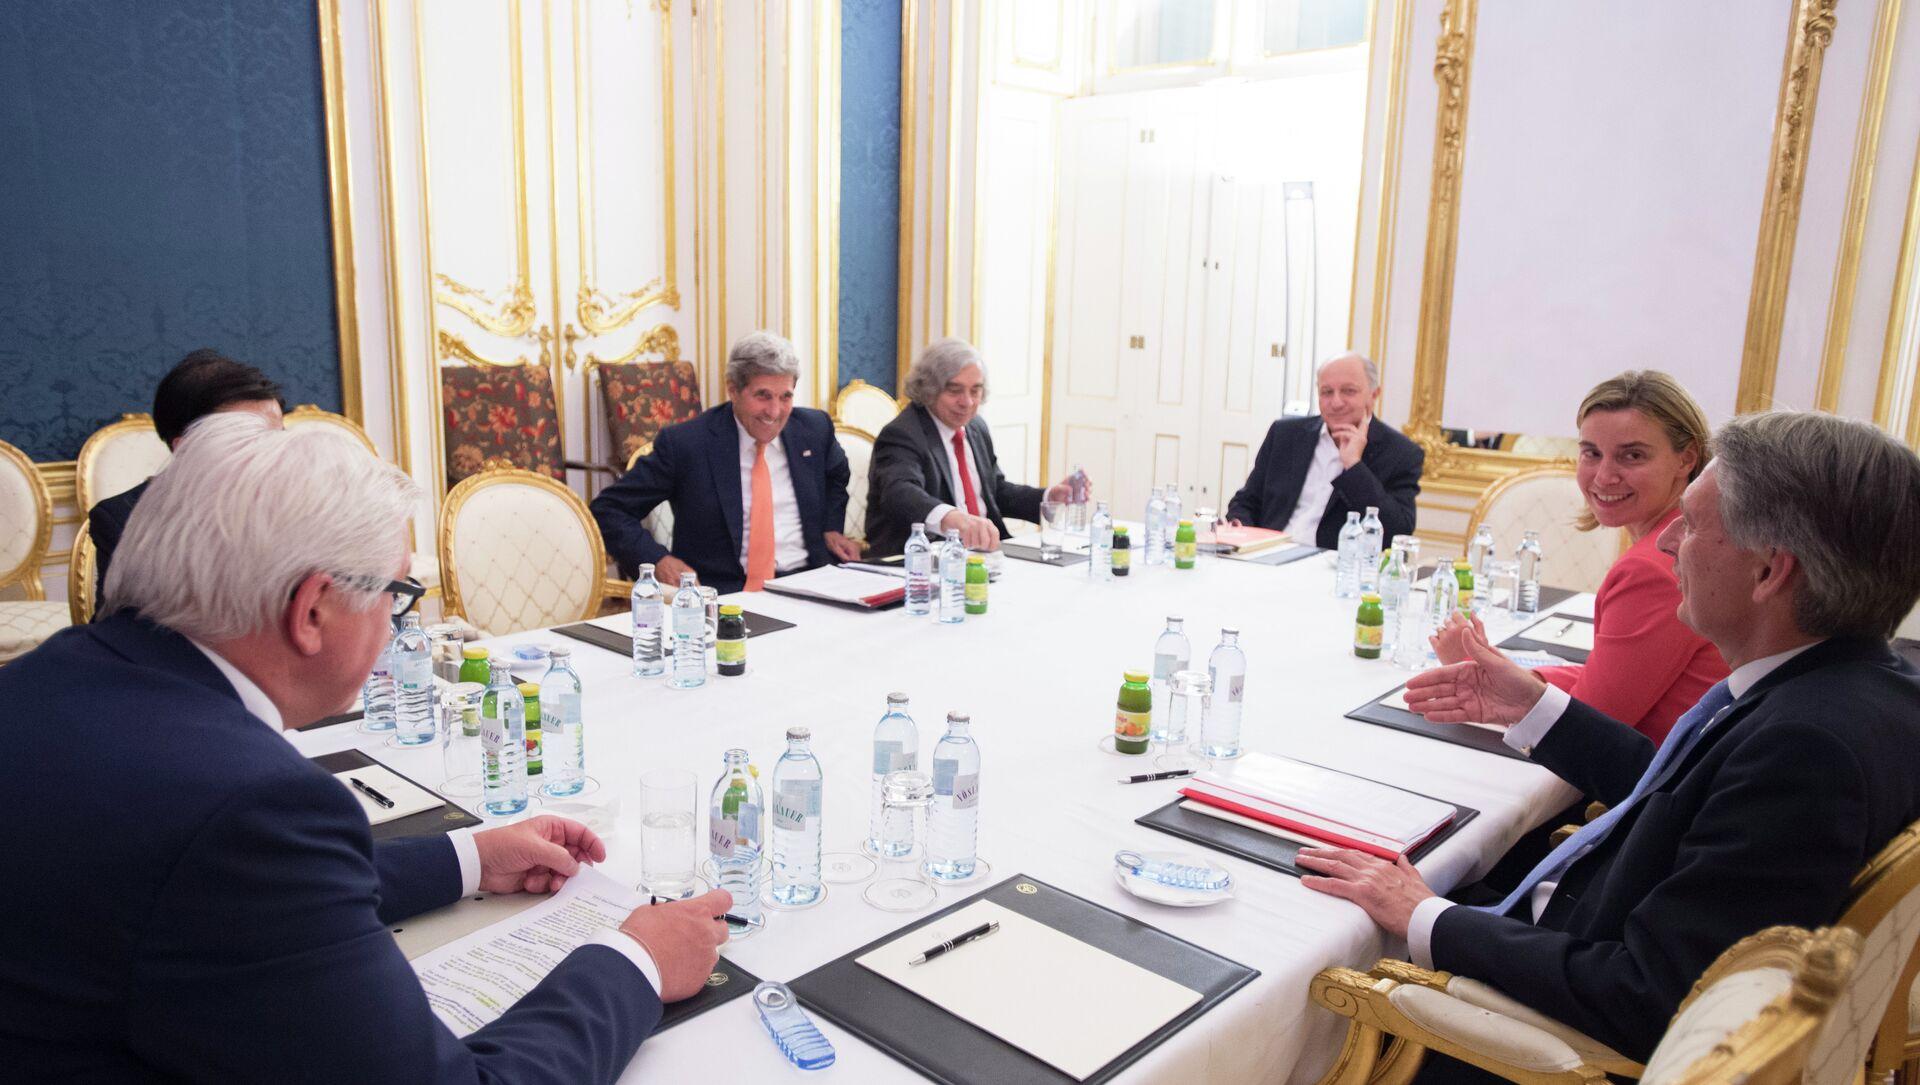 I negoziati sul nucleare iraniano nel 2015 a Vienna - Sputnik Italia, 1920, 24.02.2021